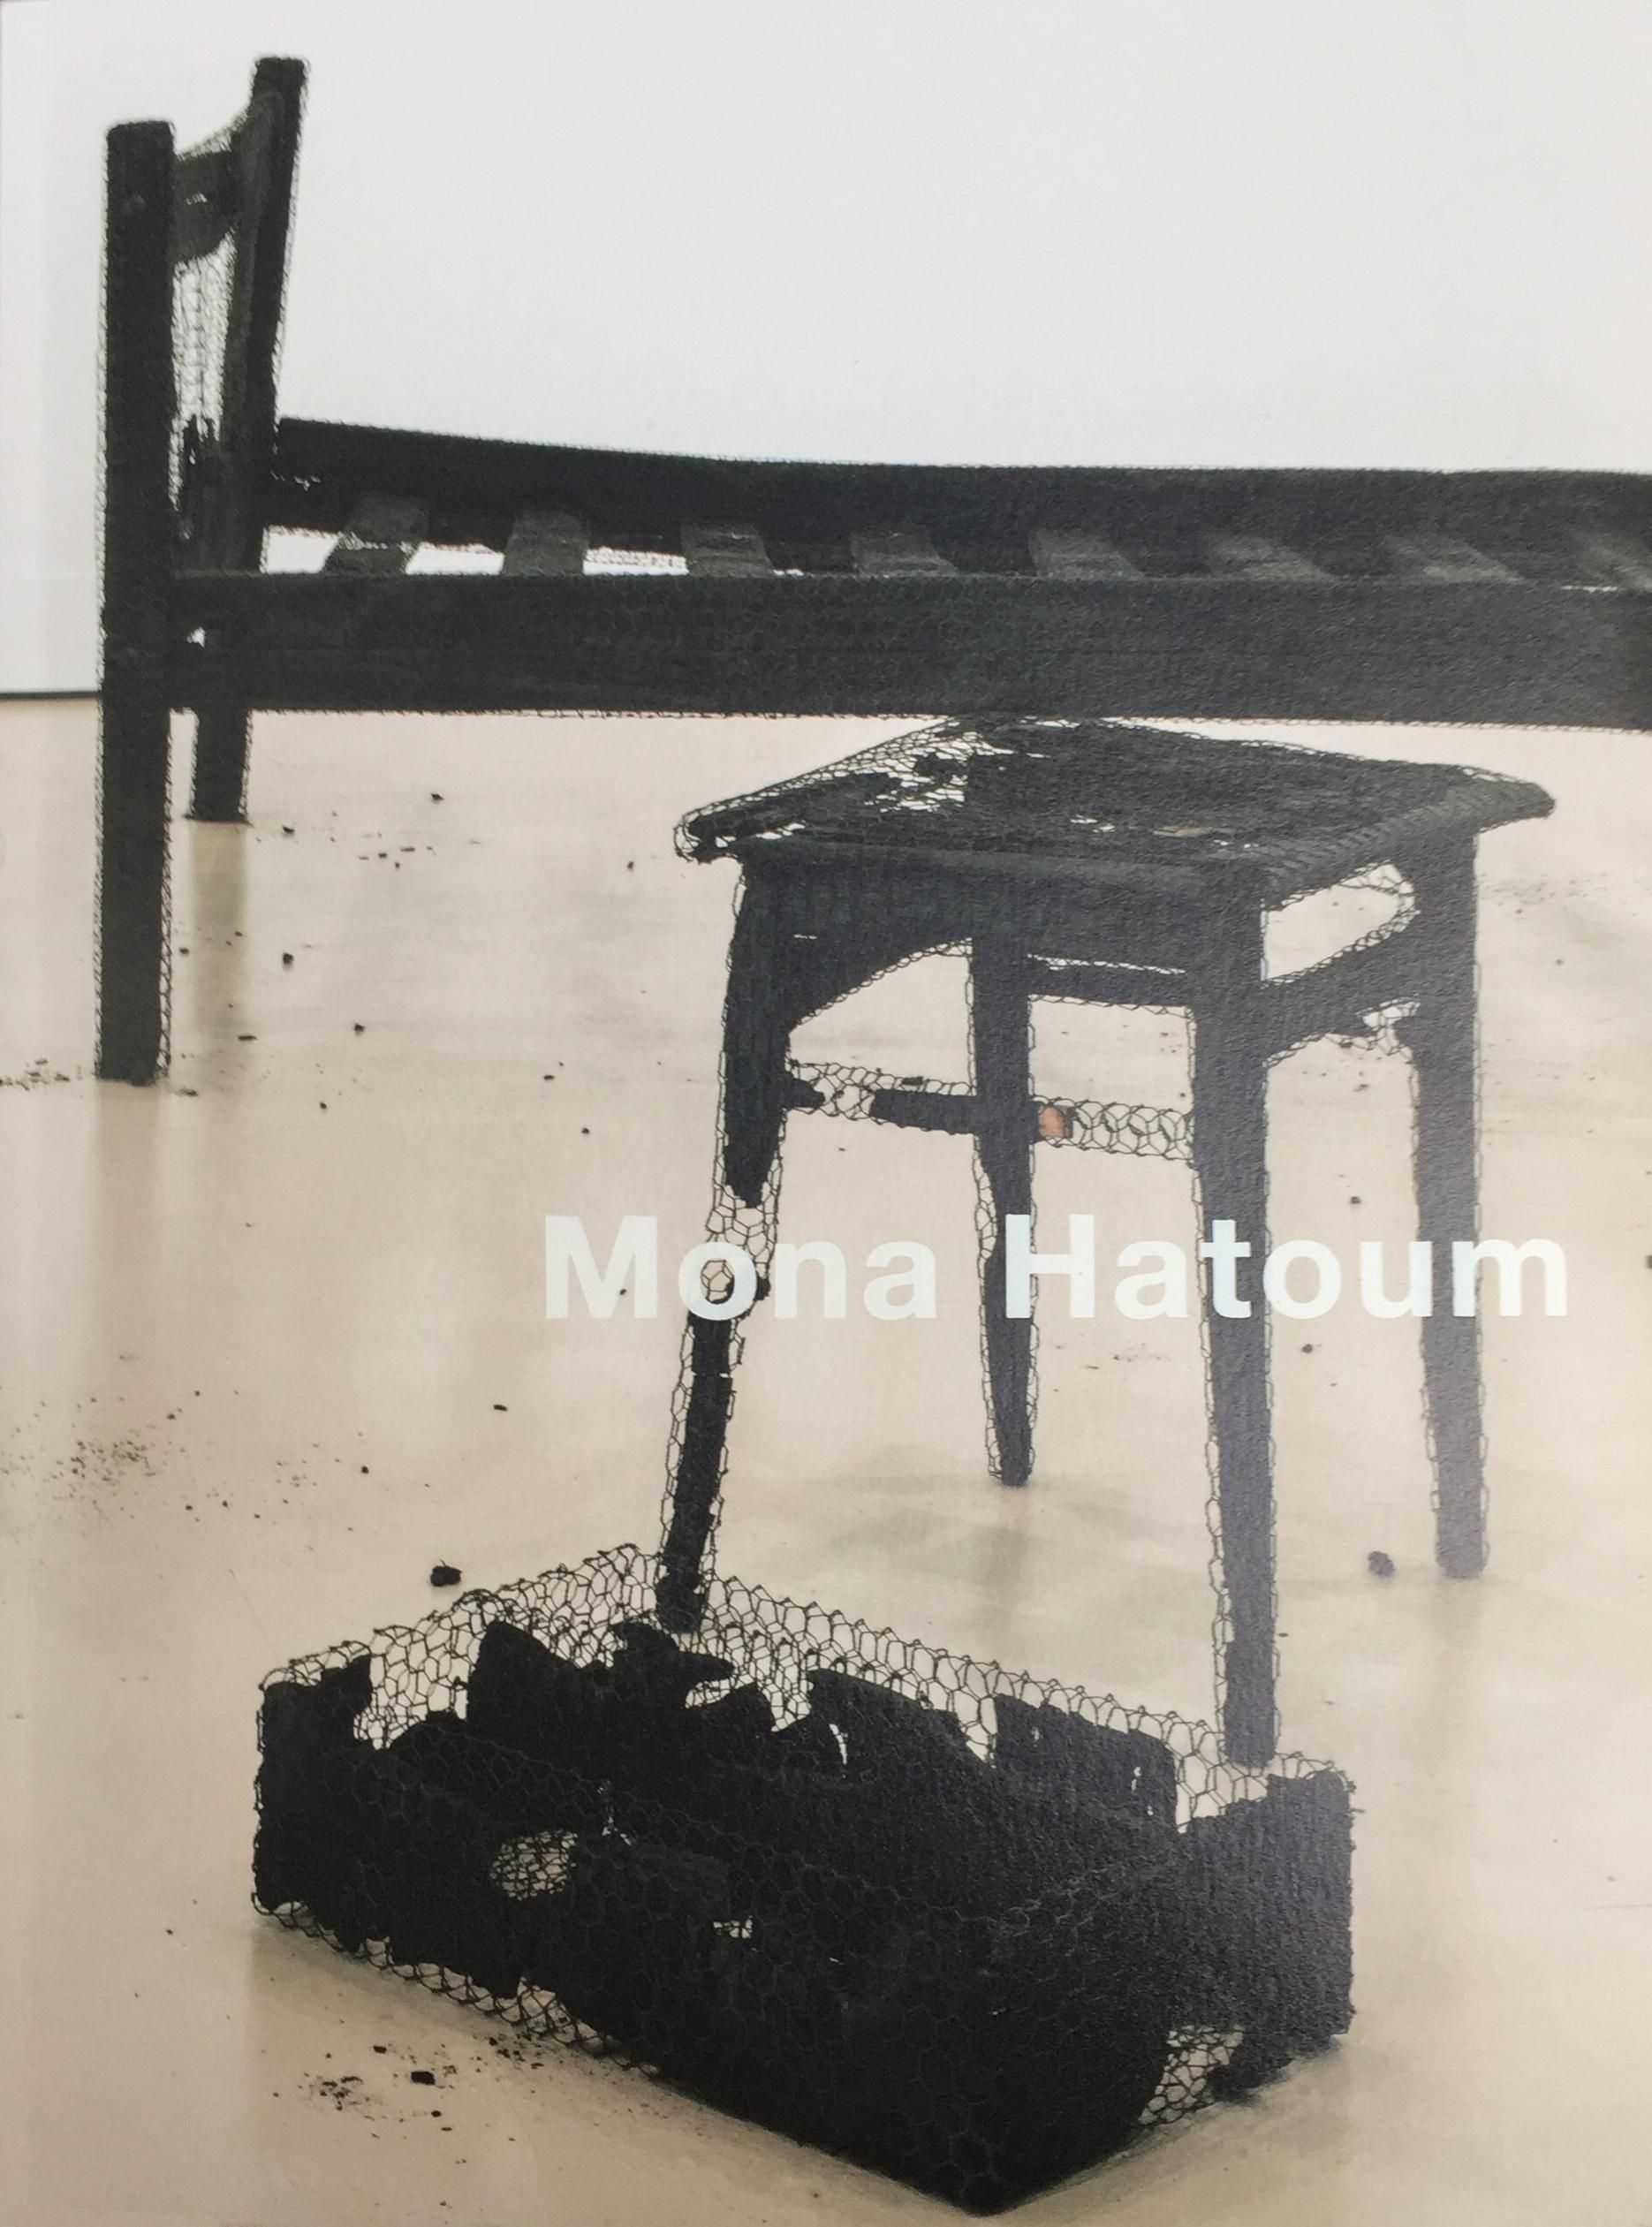 Mona Hatoum - The 10th Hiroshima Art Prize